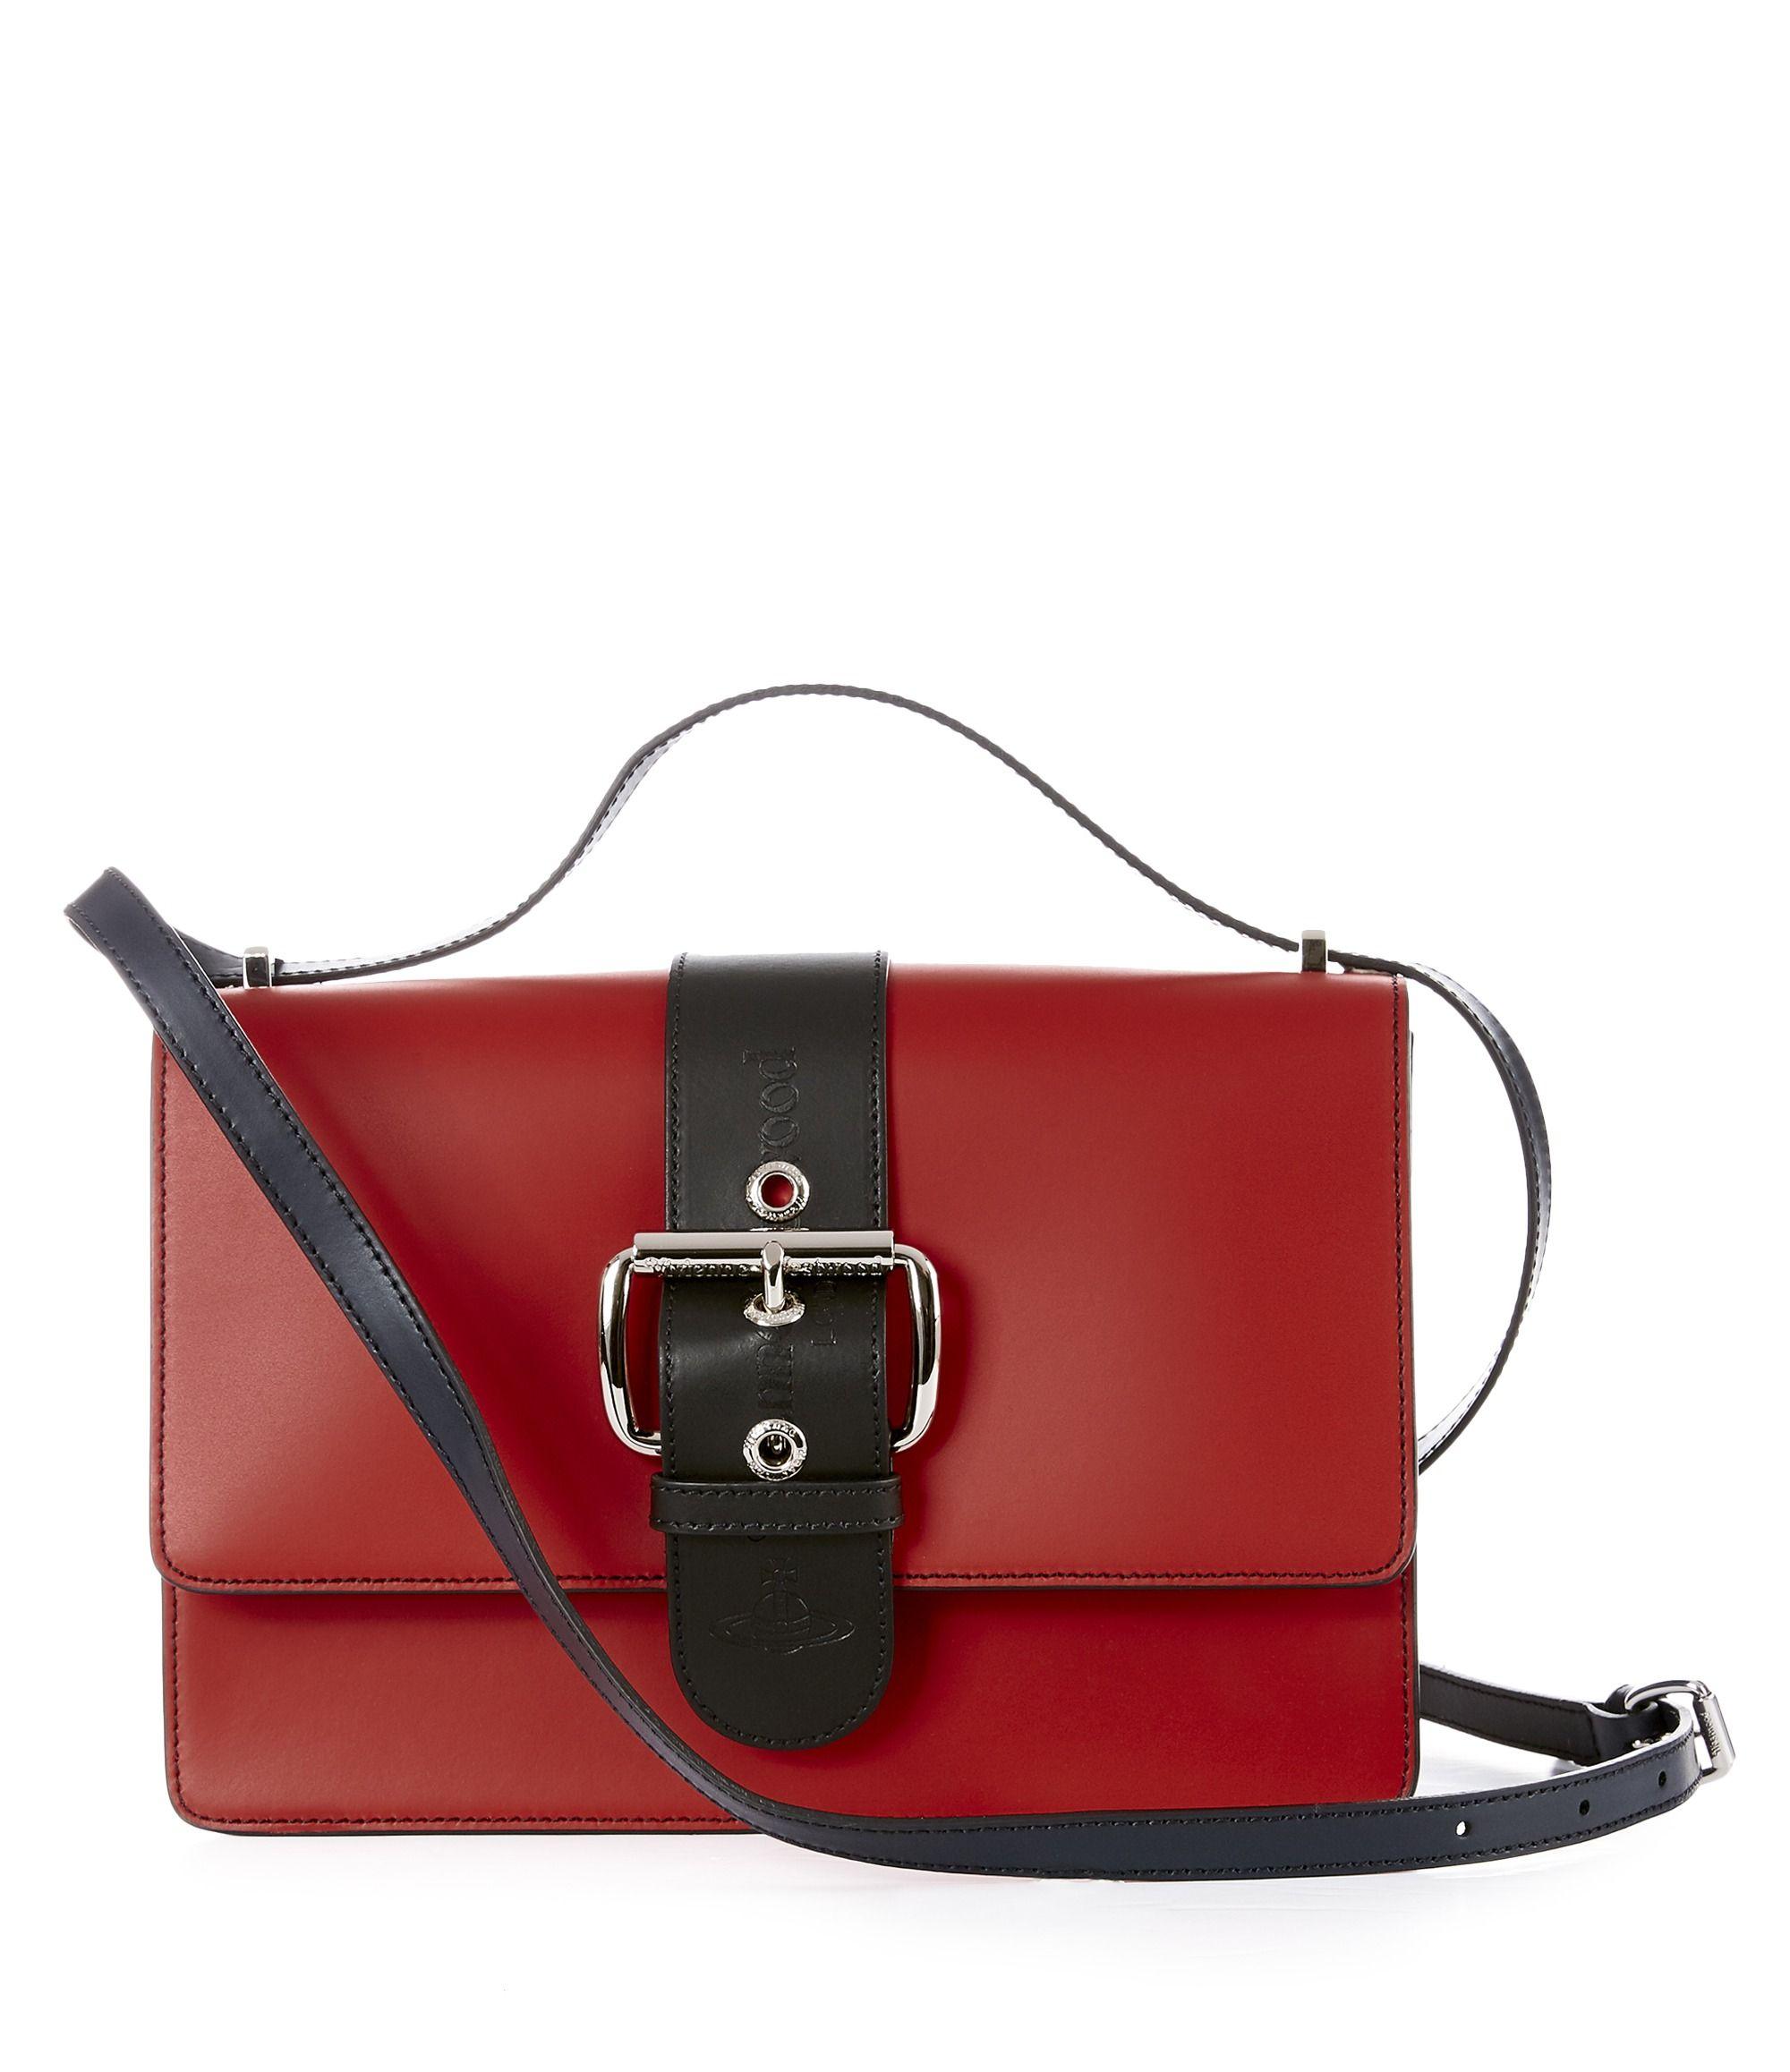 f73456e465 VIVIENNE WESTWOOD Alex Crossbody Bag 43040009 Red.  viviennewestwood  bags  shoulder  bags  leather  crossbody